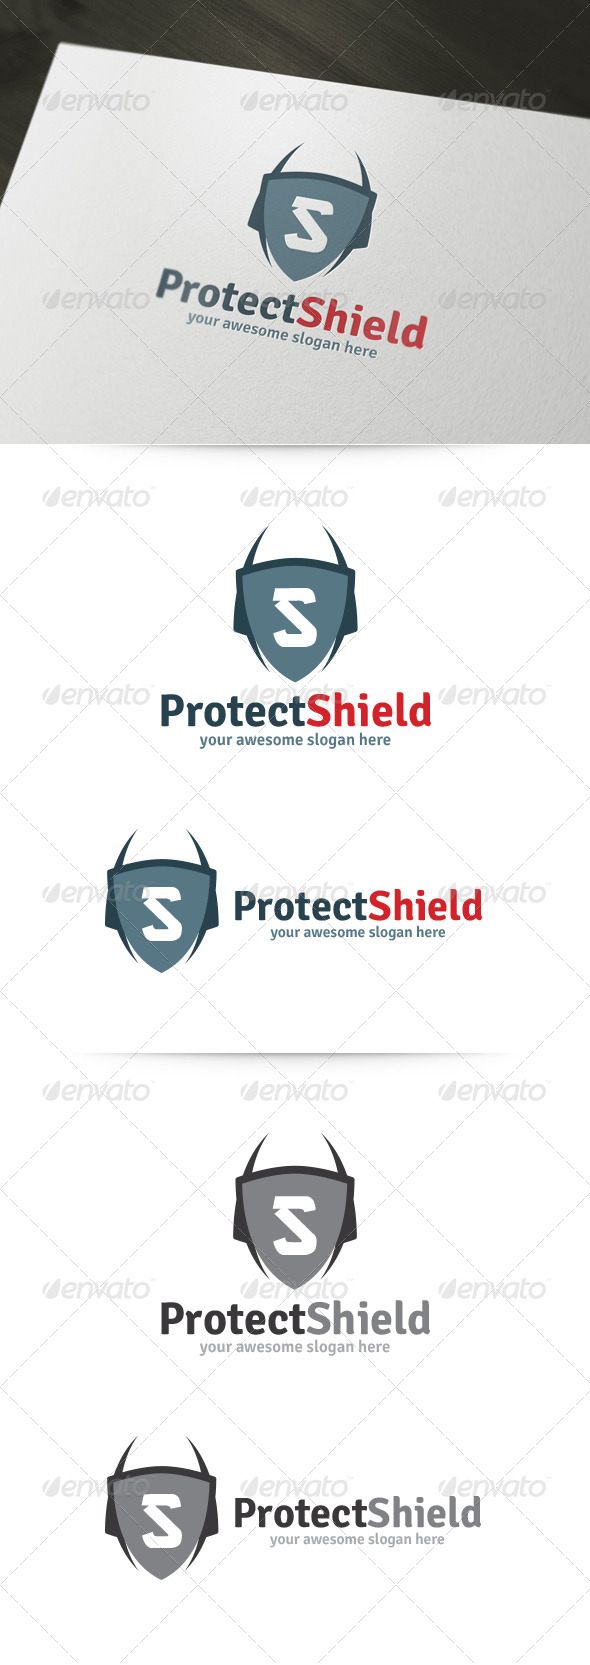 Protect Shield Logo